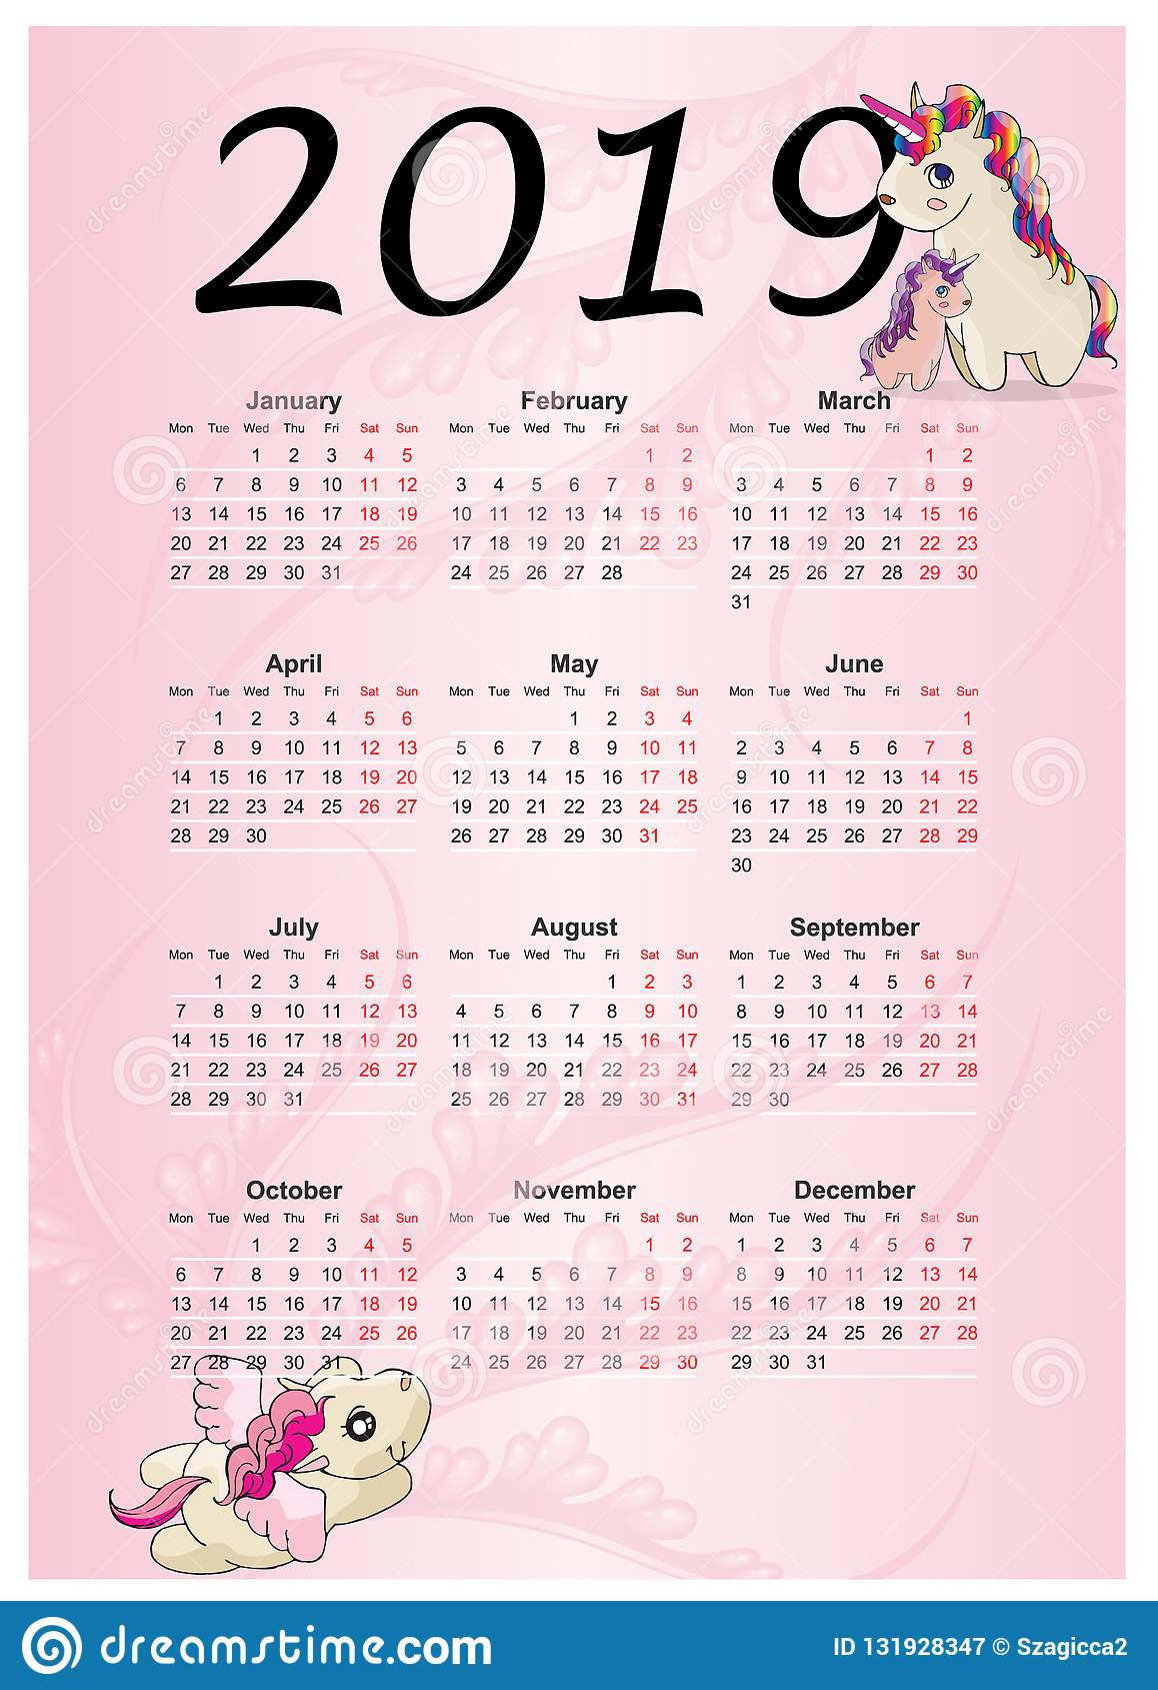 Calendario 2019 Con Numero Week.Cute Rainbow Monthly Calendar 2019 With Unicorn Stock Vector